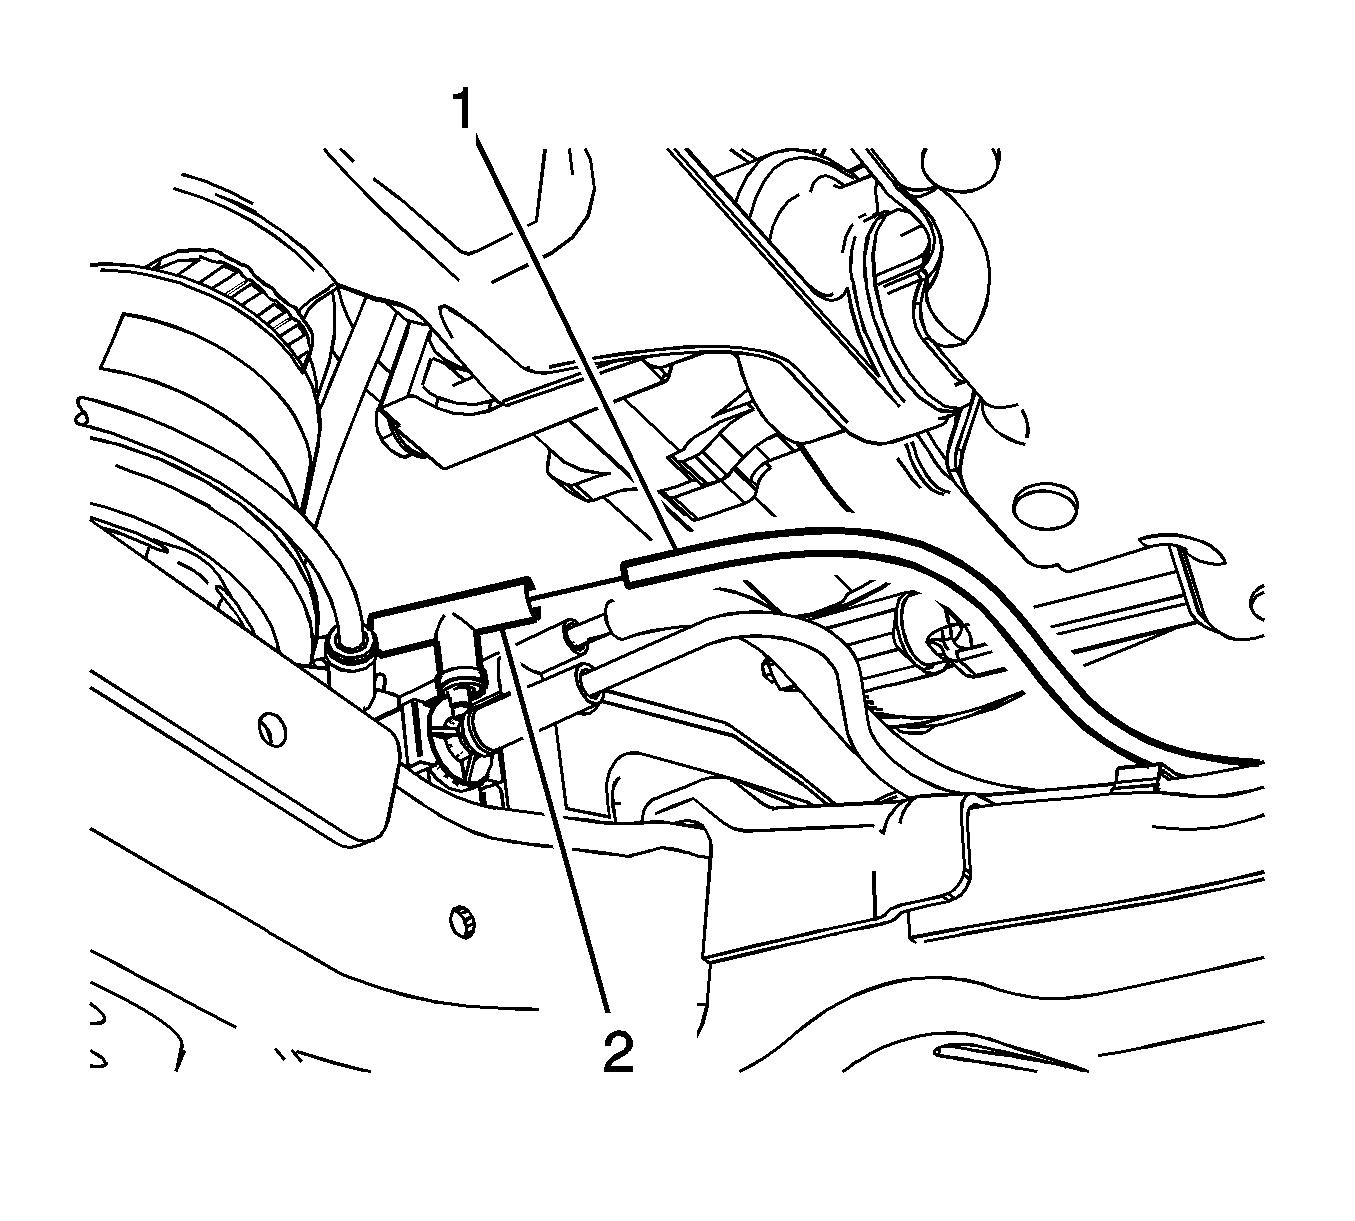 Buick Enclave Engine Diagram : Buick Enclave 3 6 Engine